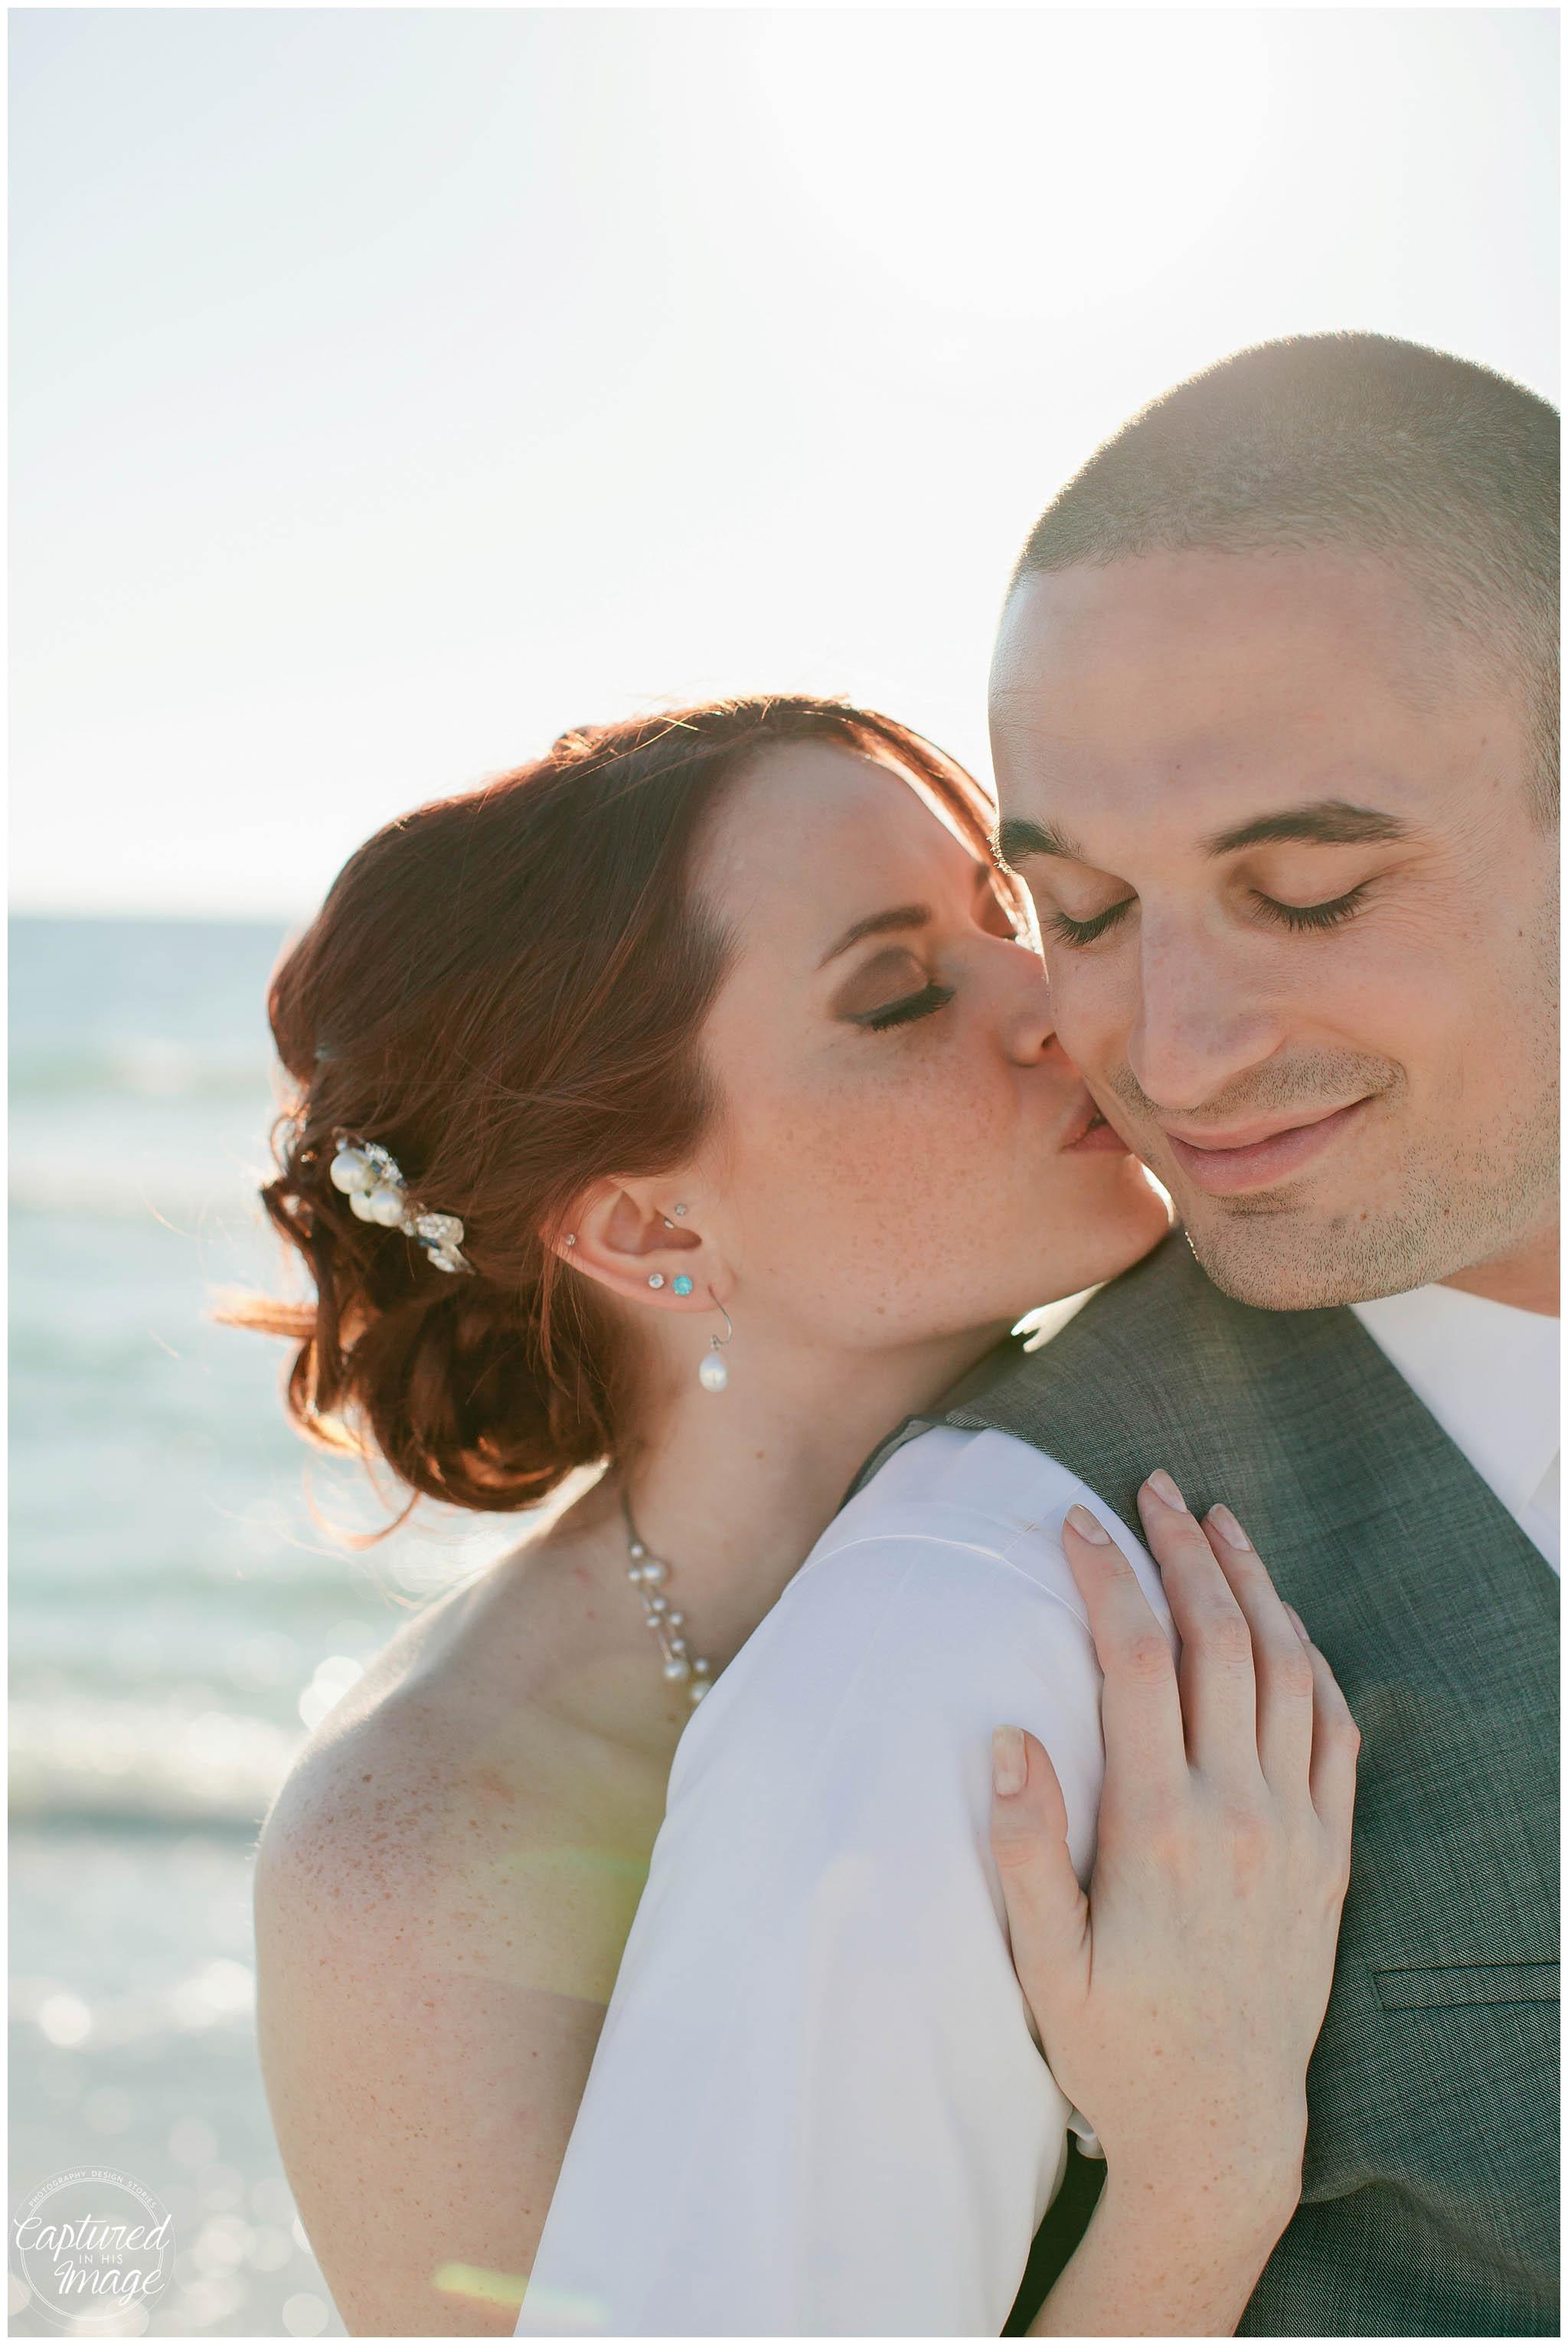 St. Pete Beach Destination Wedding (29 of 81)